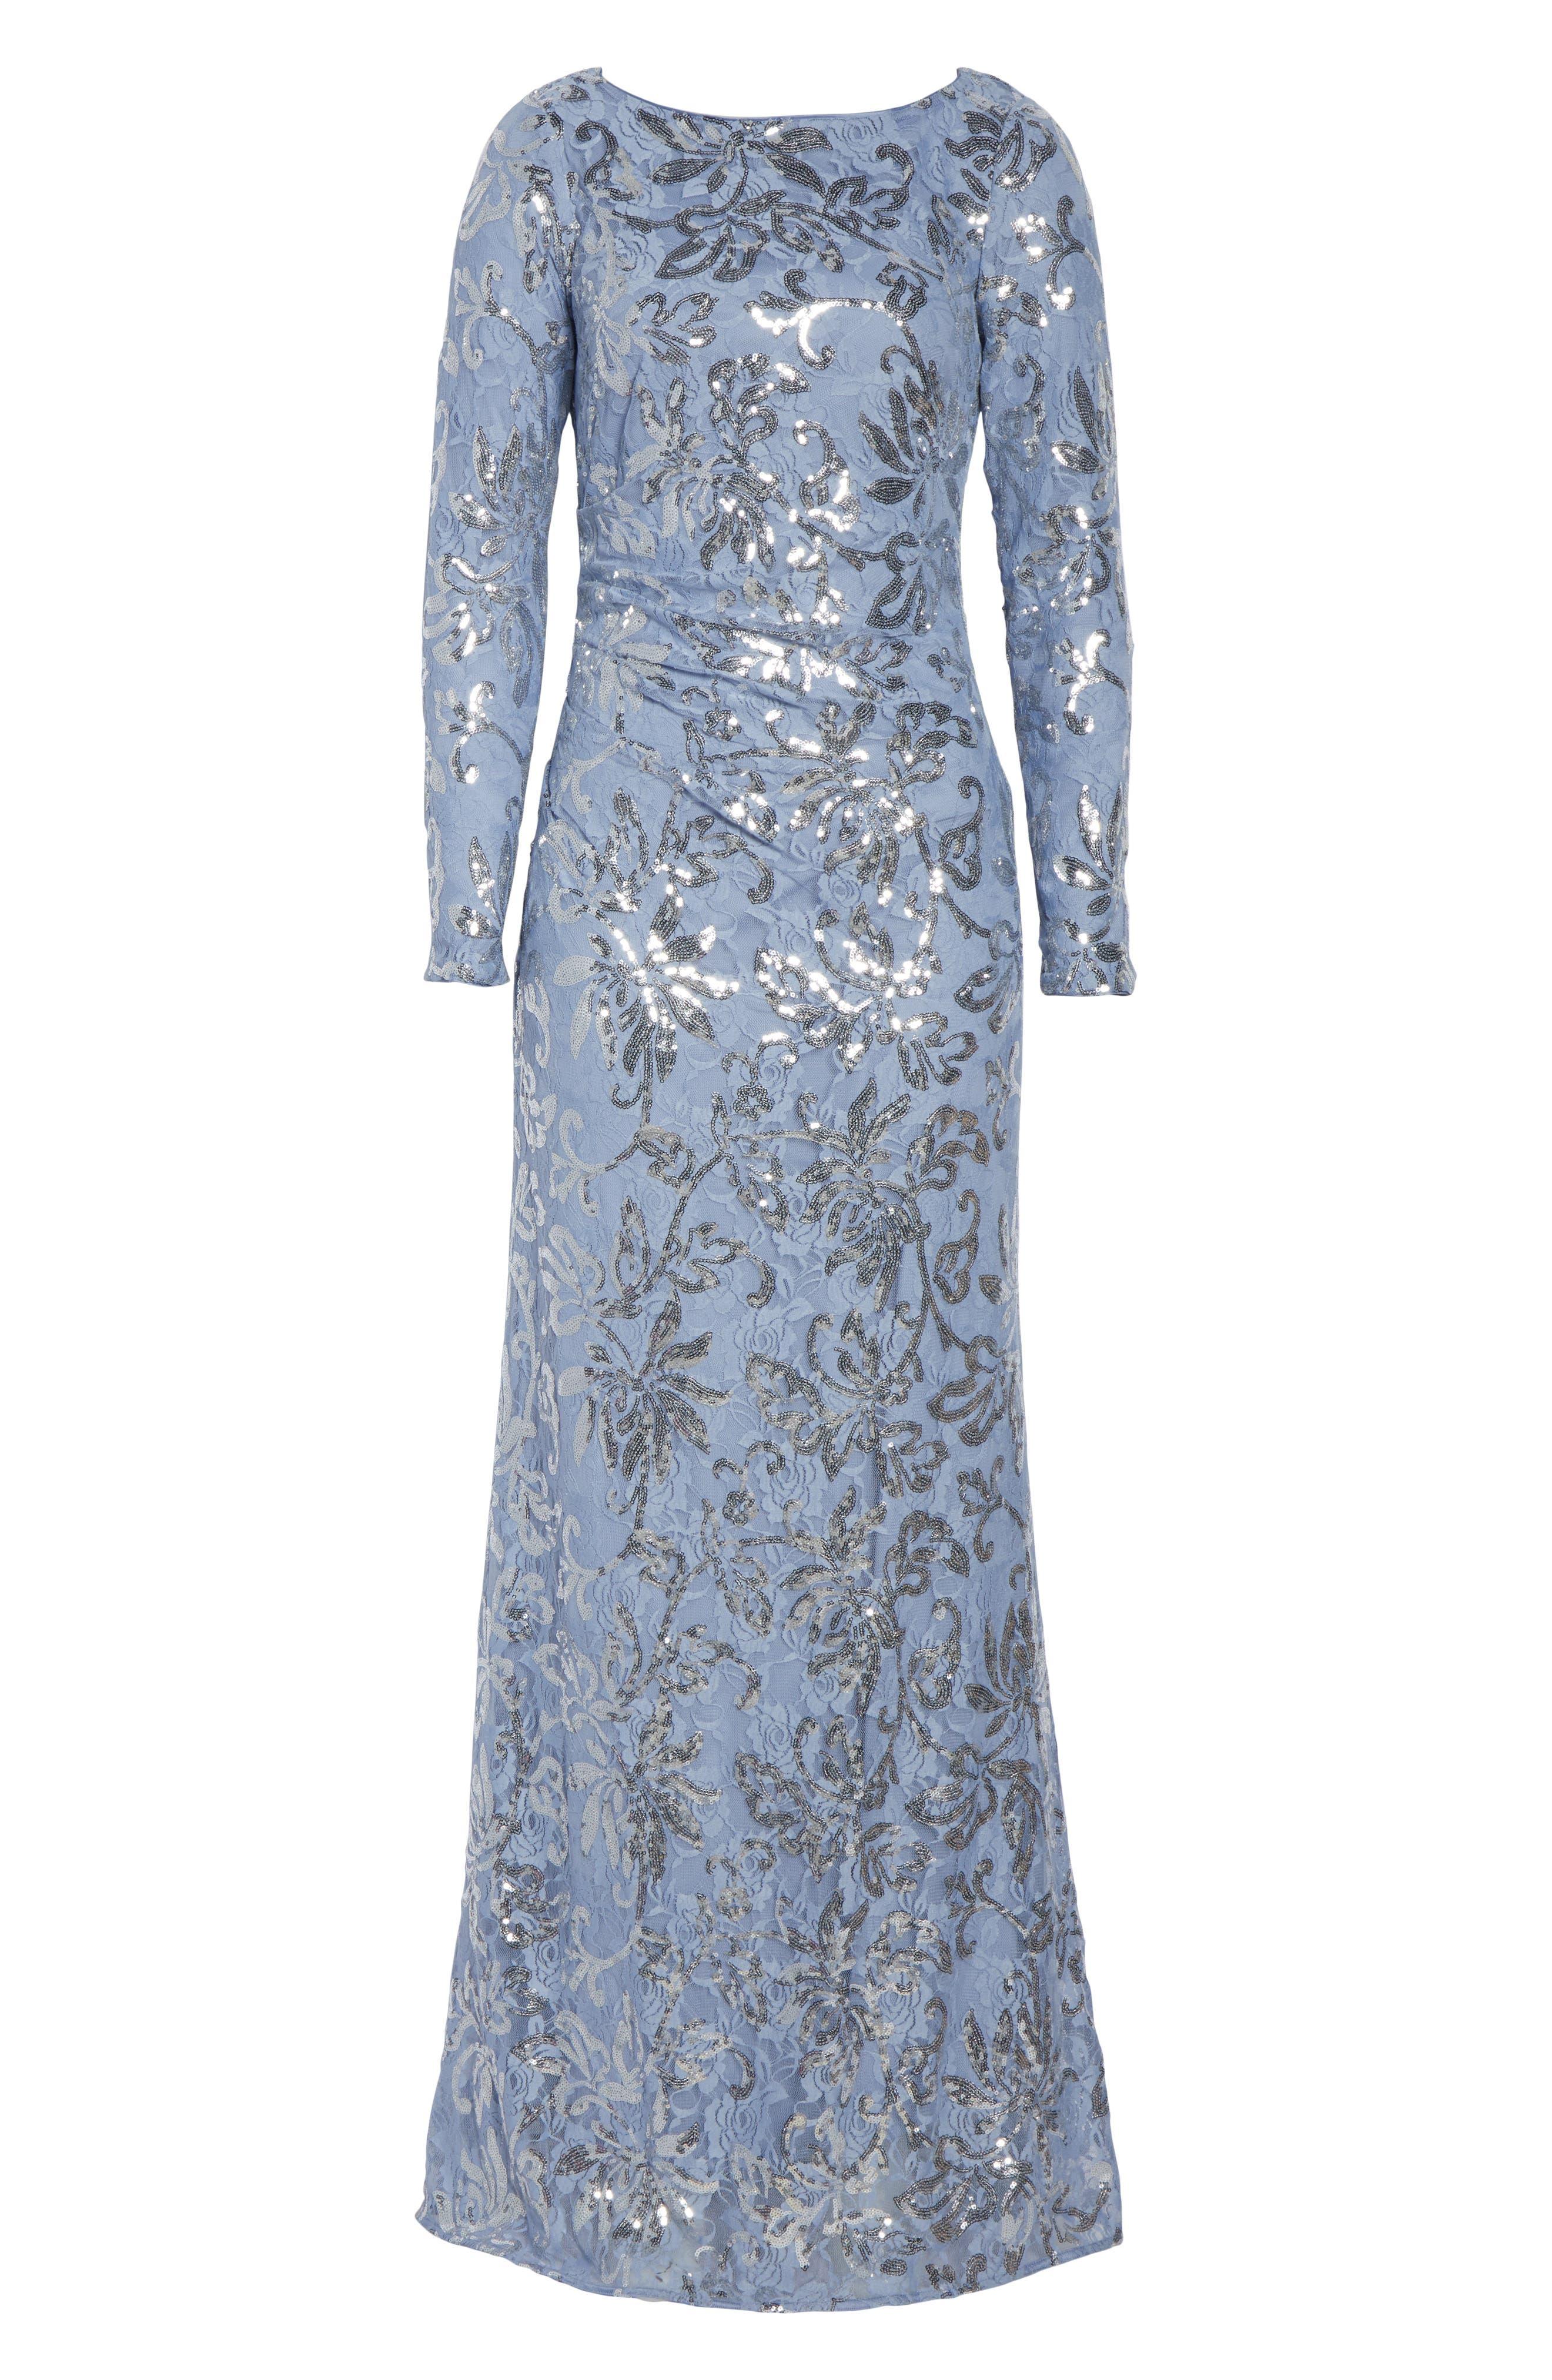 VINCE CAMUTO, Lace & Sequin Evening Dress, Alternate thumbnail 8, color, SKY BLUE